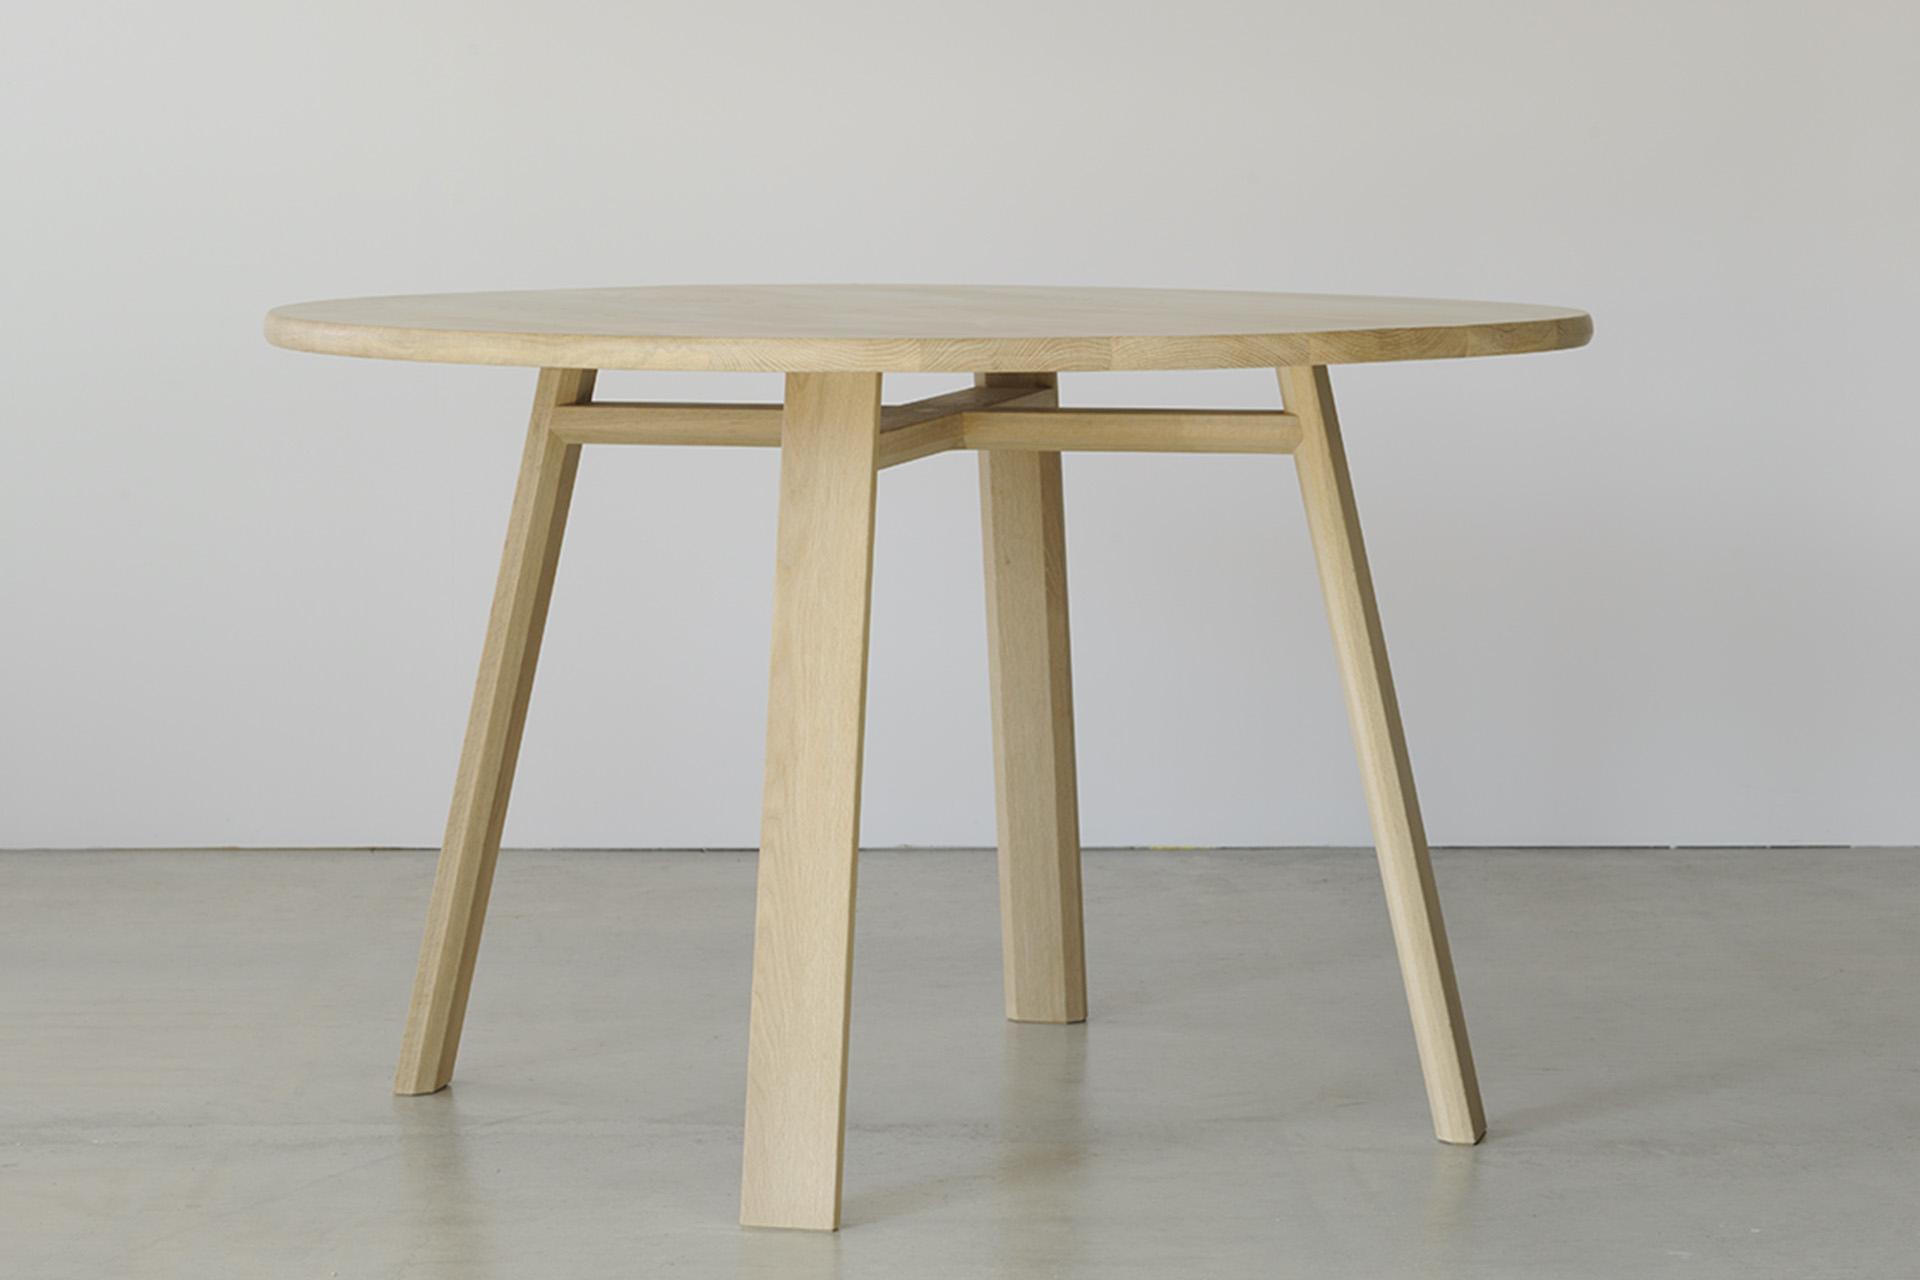 hhh table